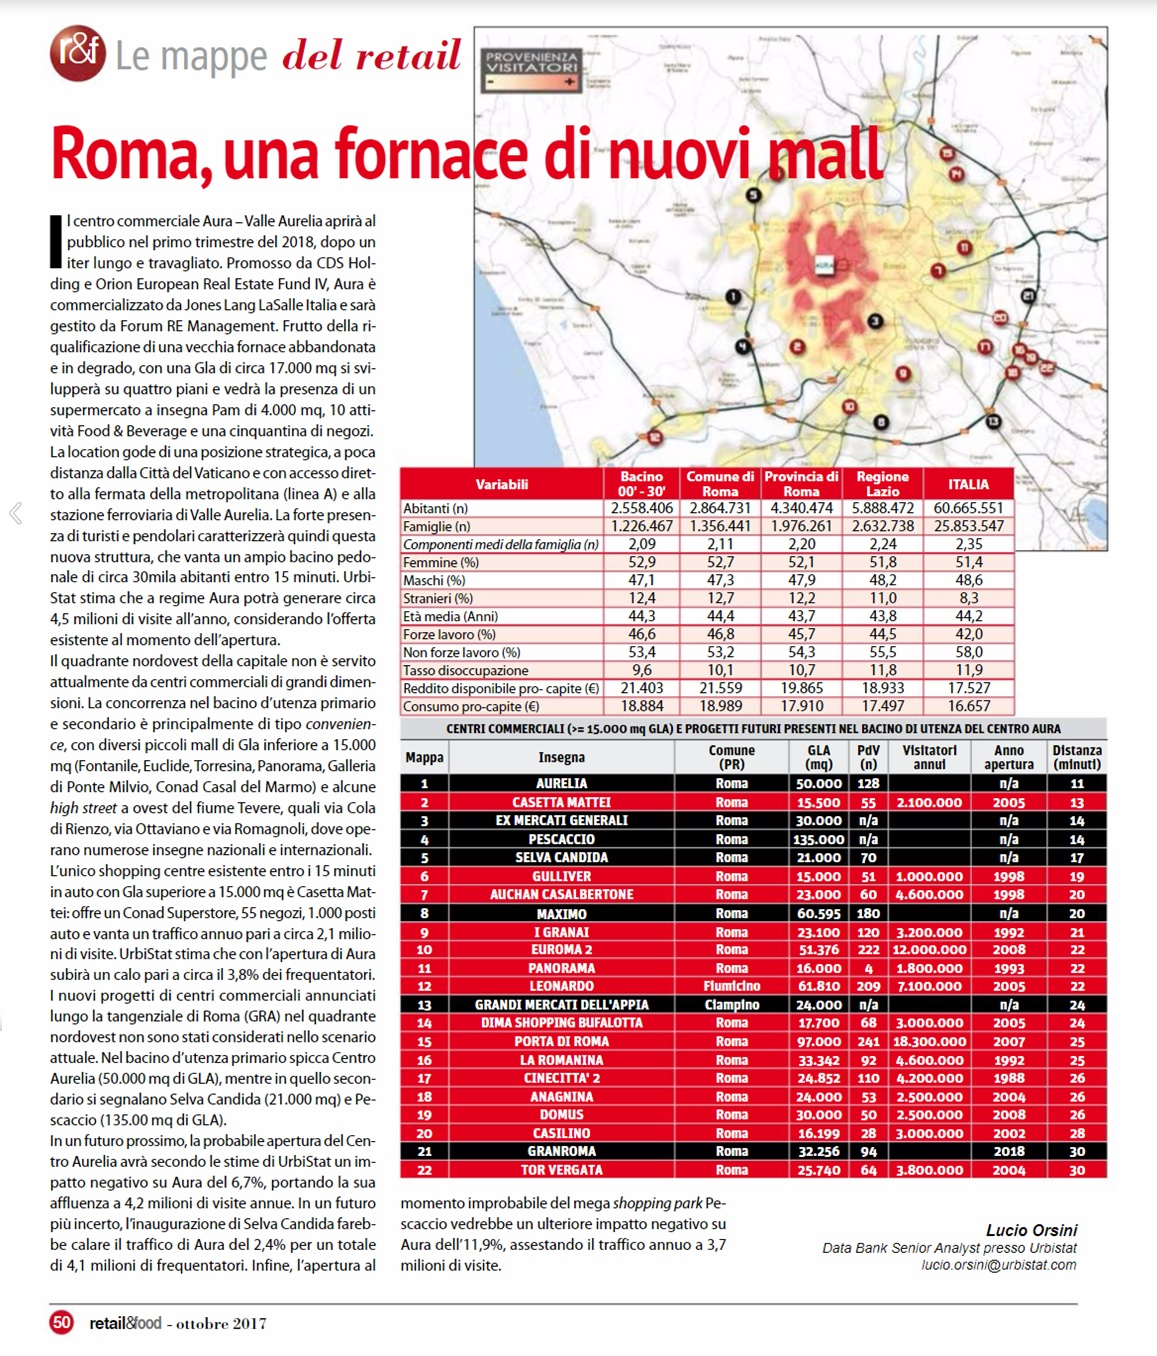 Roma, new malls (in italian)